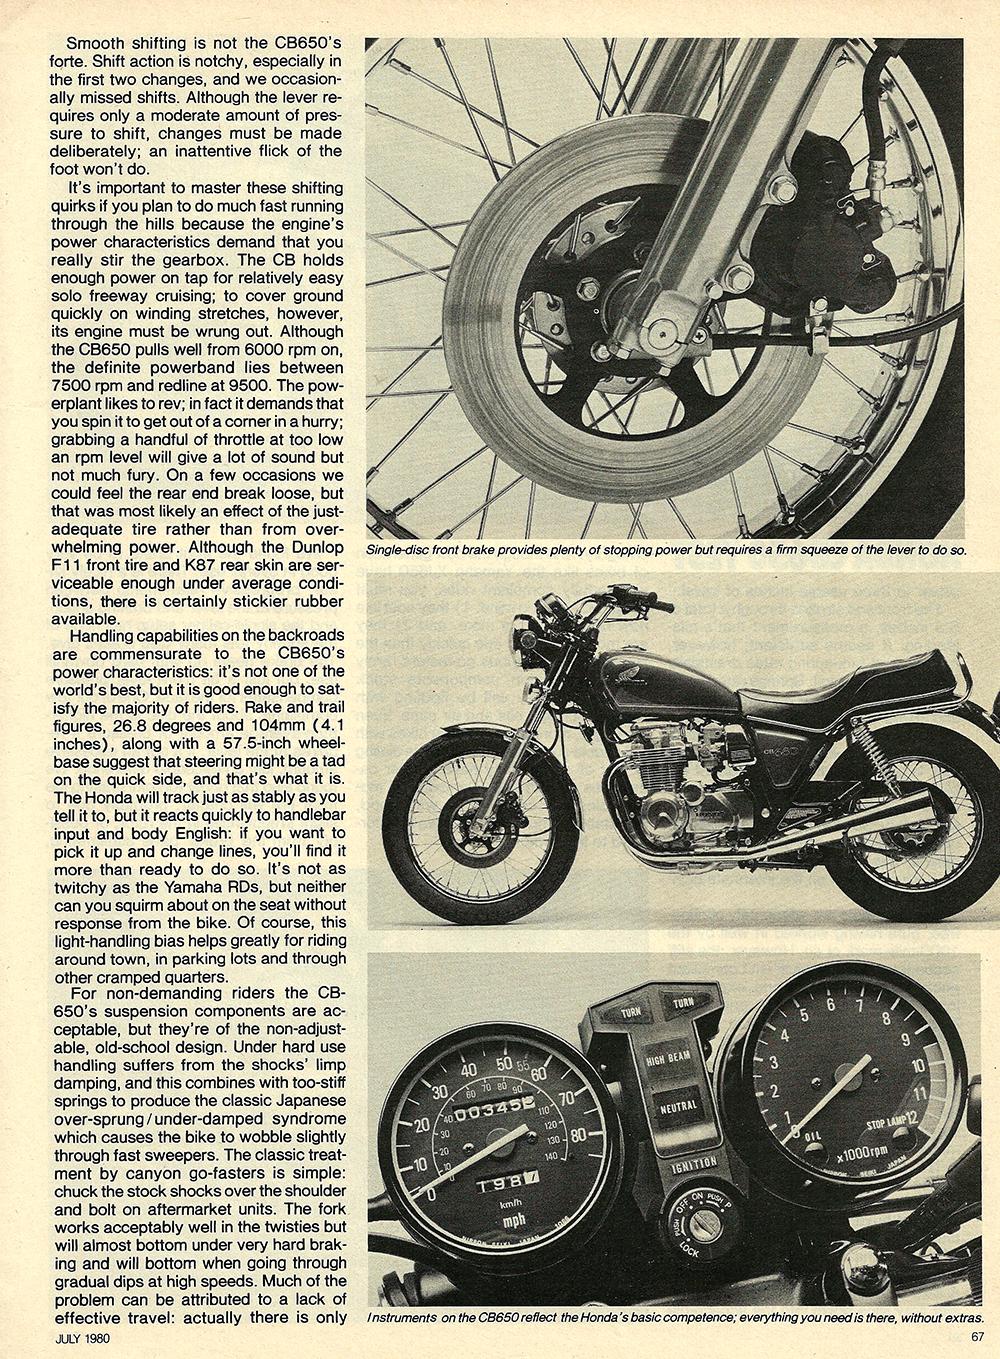 1980 Honda CB650 road test 04.jpg